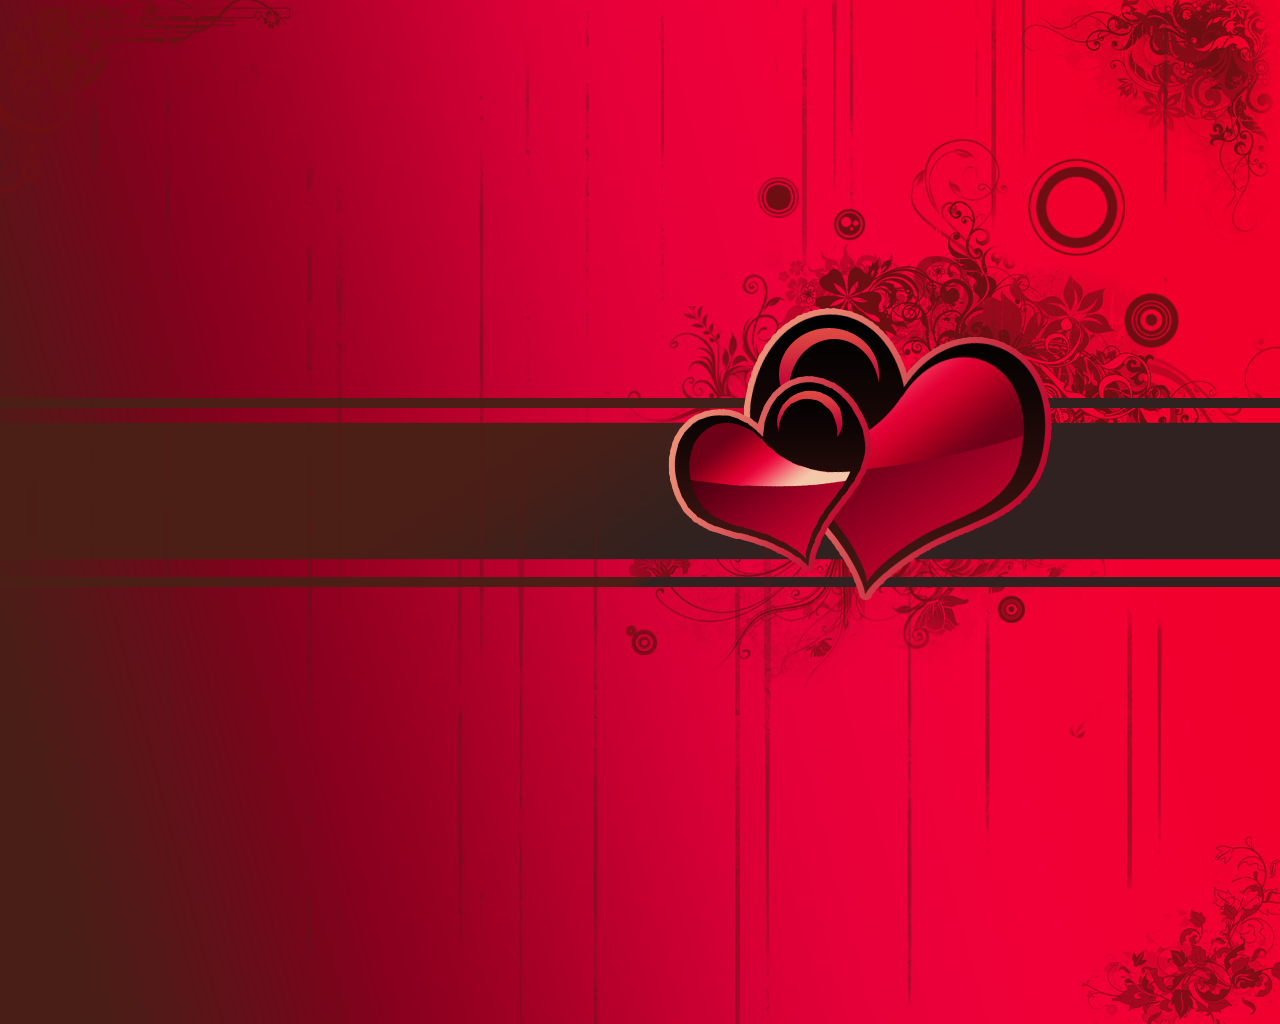 valentine day wallpaper 2015   Grasscloth Wallpaper 1280x1024